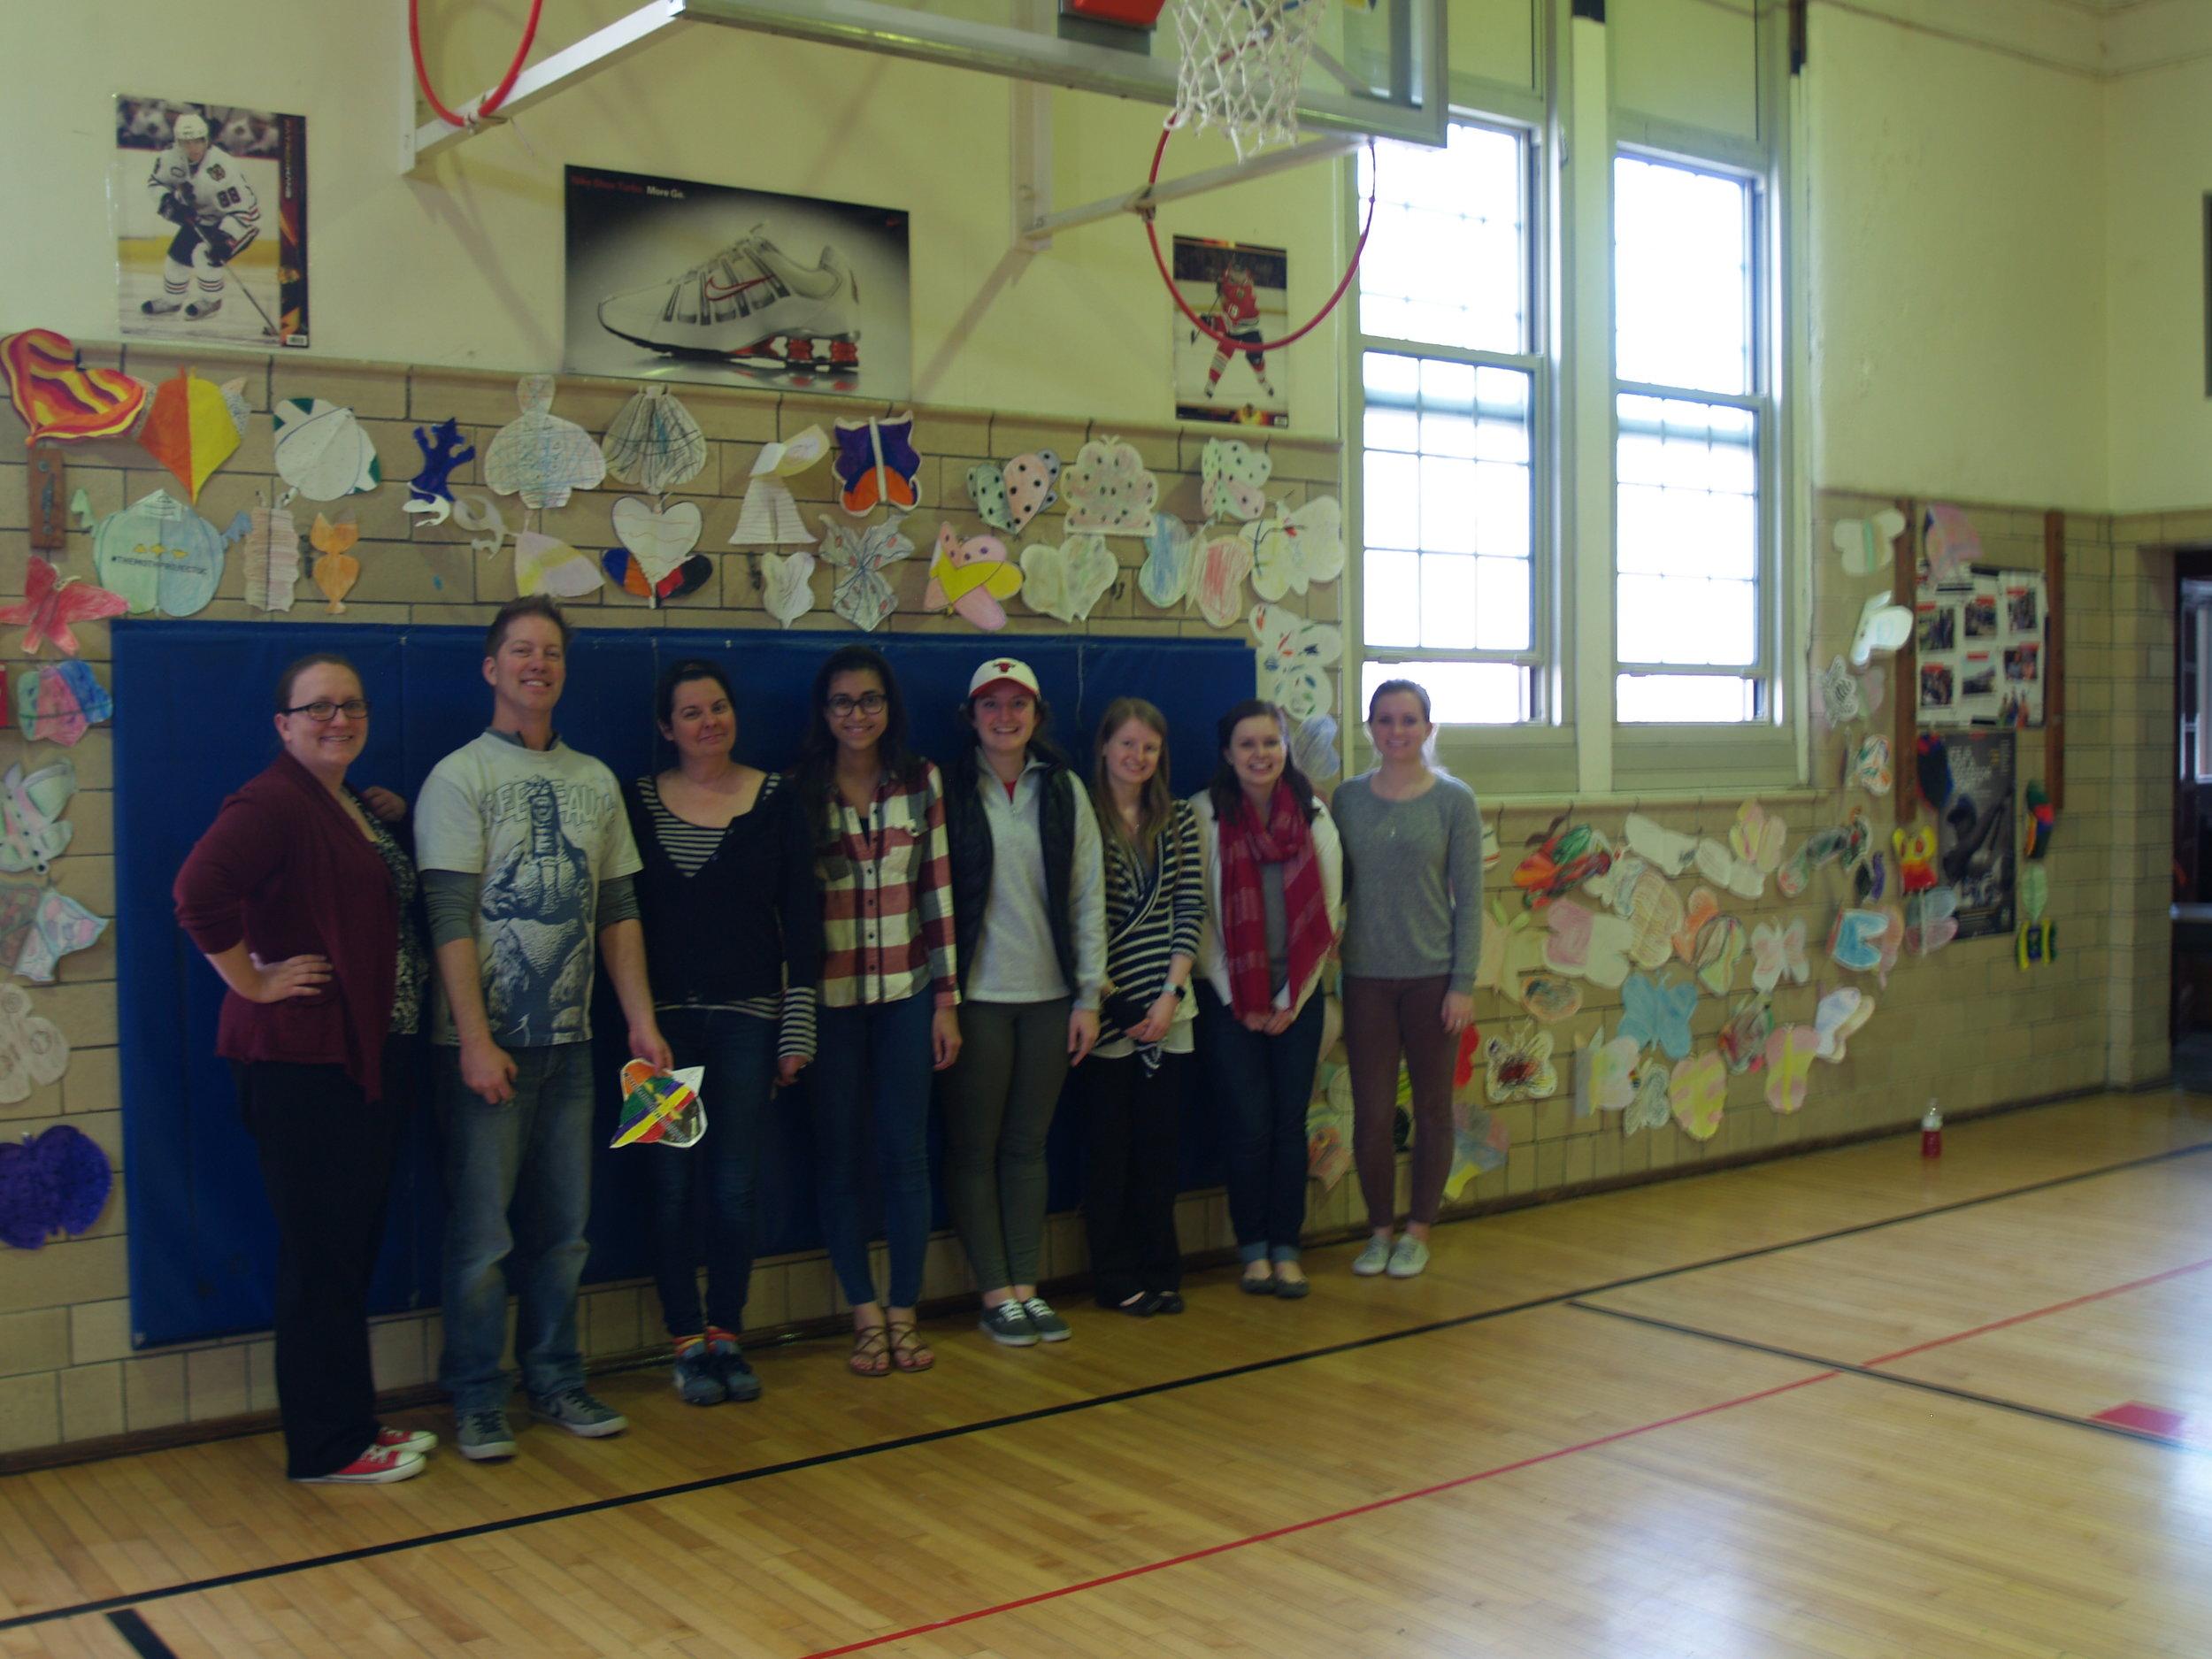 Claire Kovacs, Jeff Schmuki, Wendy DesChene and Augustana Education students